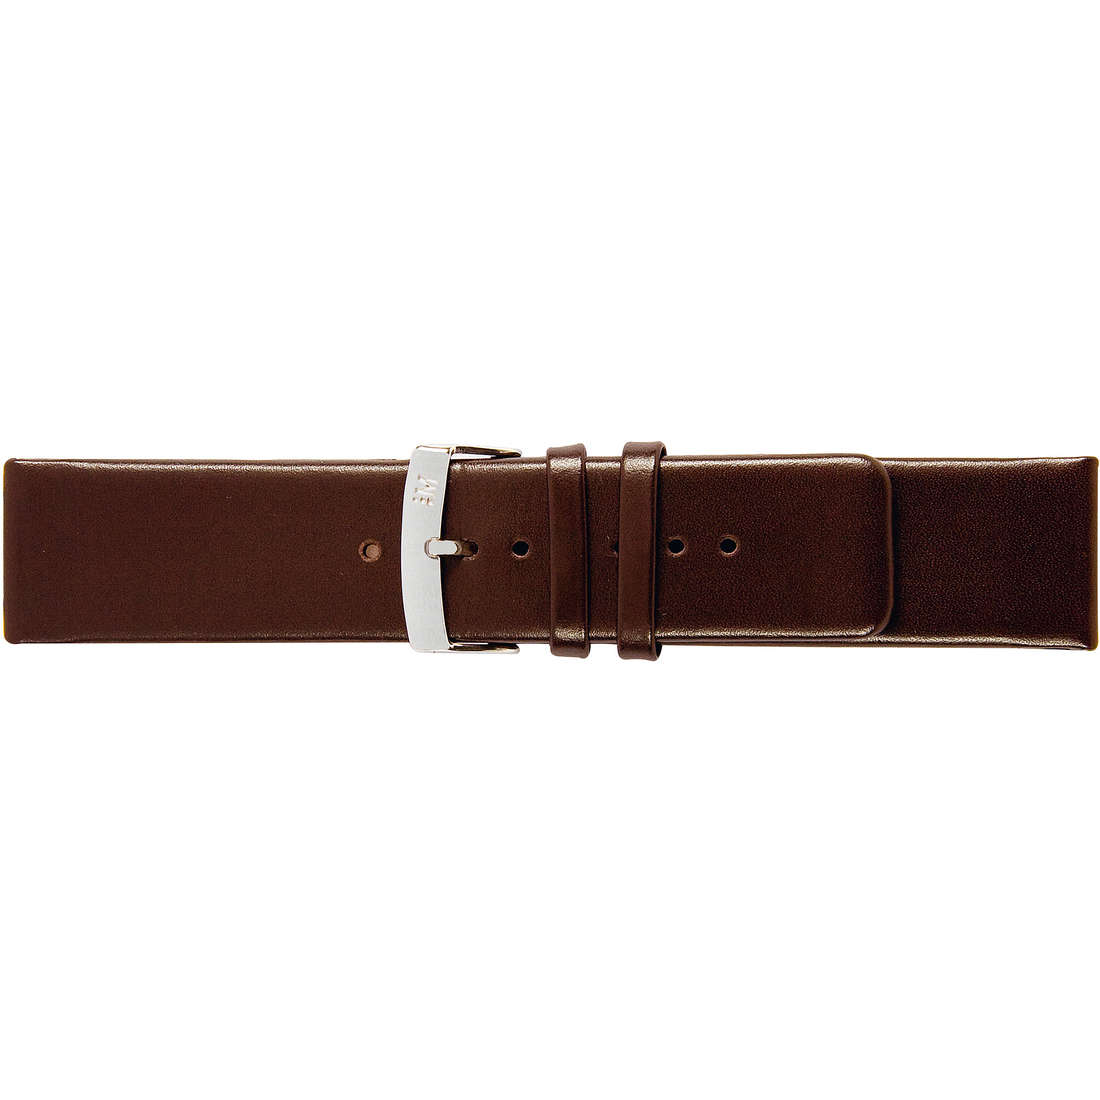 watch watch bands watch straps man Morellato Morellato 1930 A01X3076875032CR22